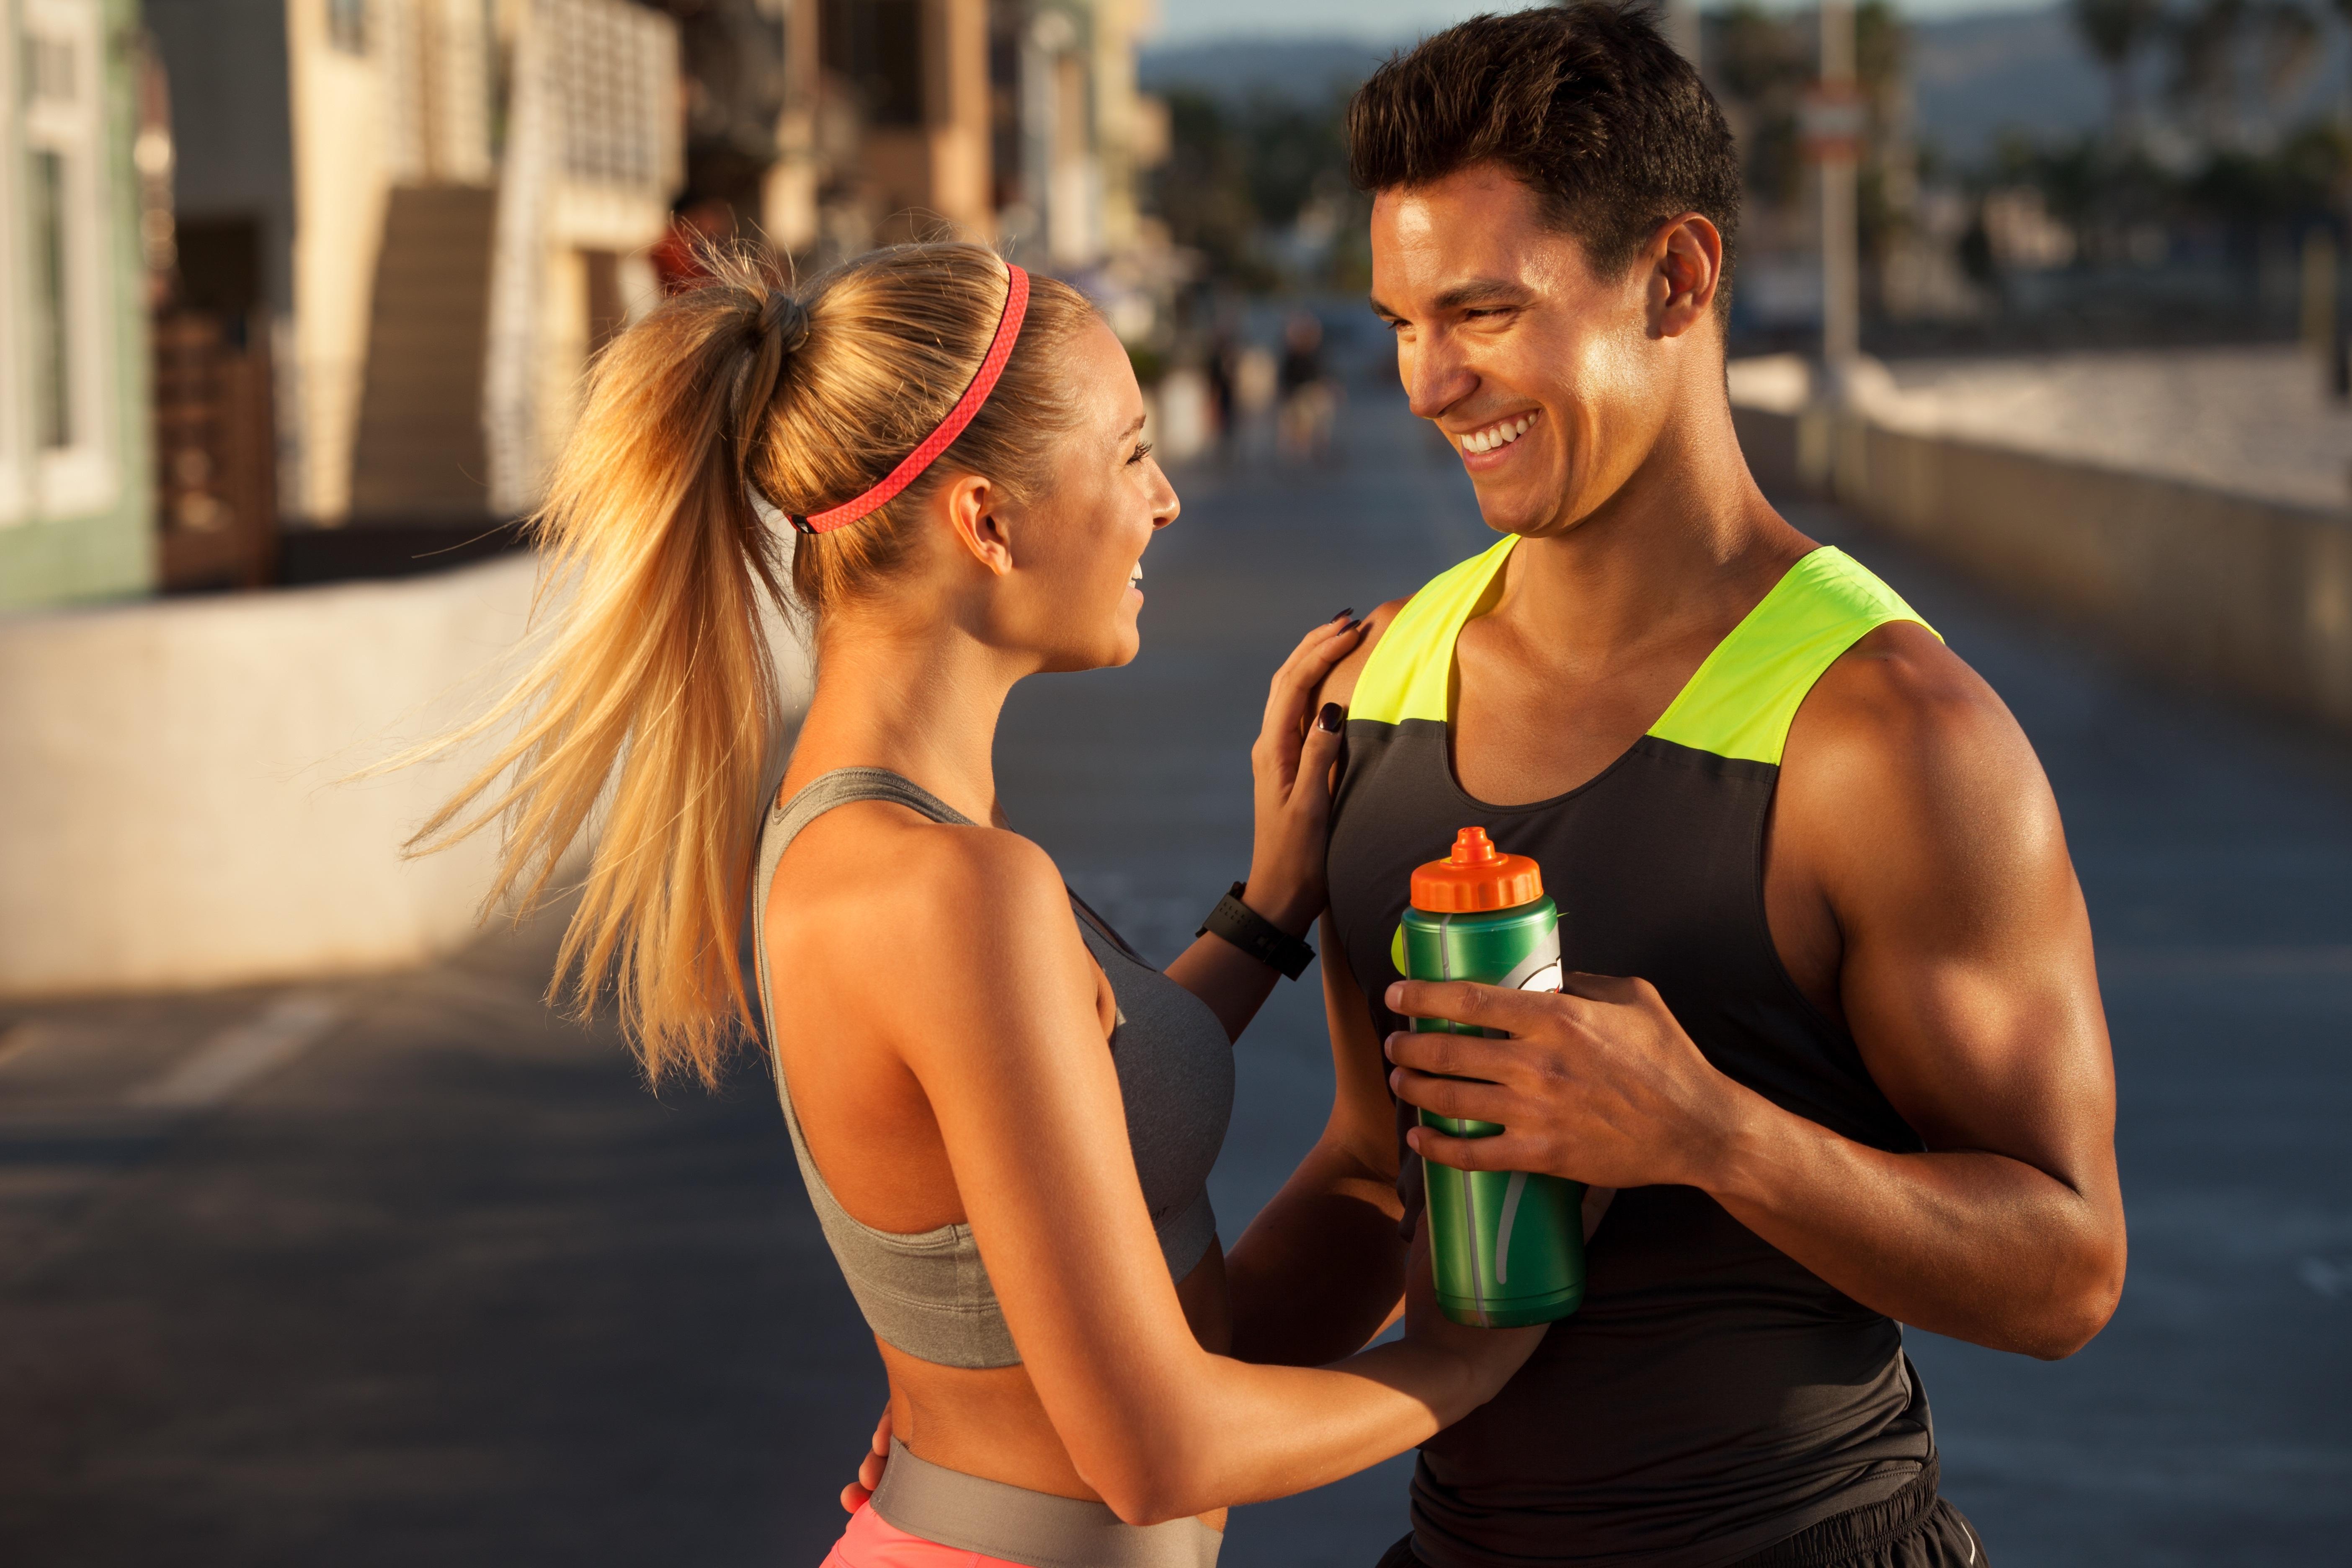 Fitness-Homepage erstellen